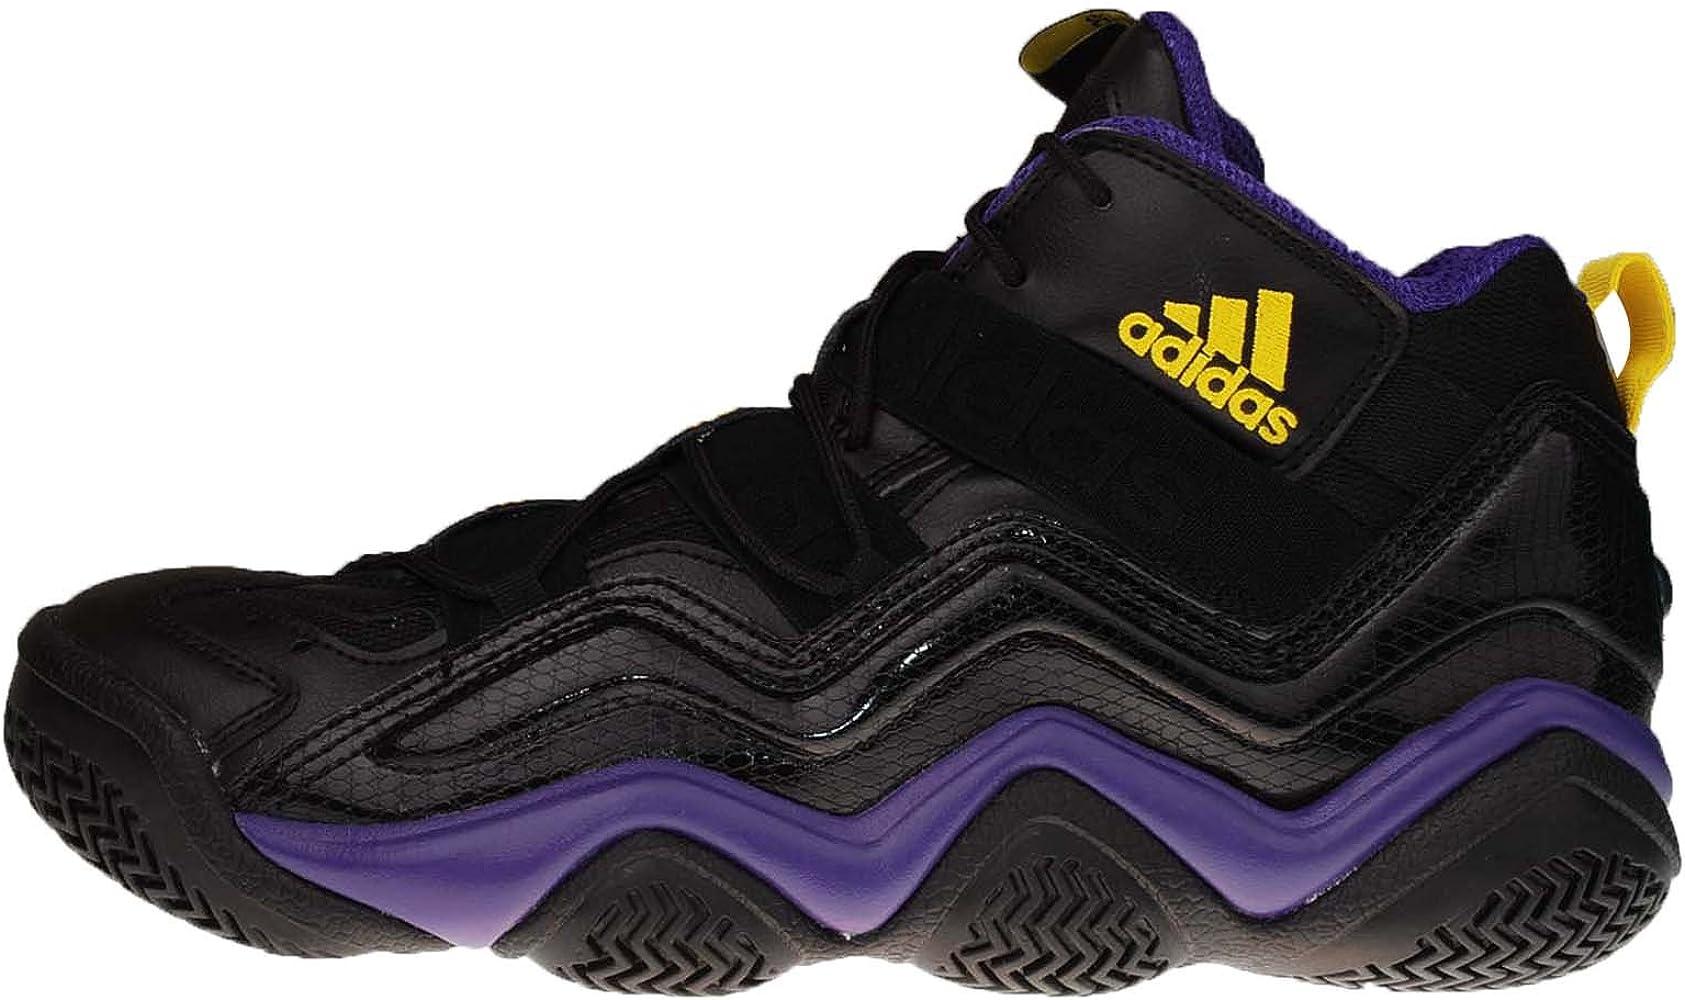 Adidas Adidas Top Ten 2000 Basketball Shoes Men's Size Us